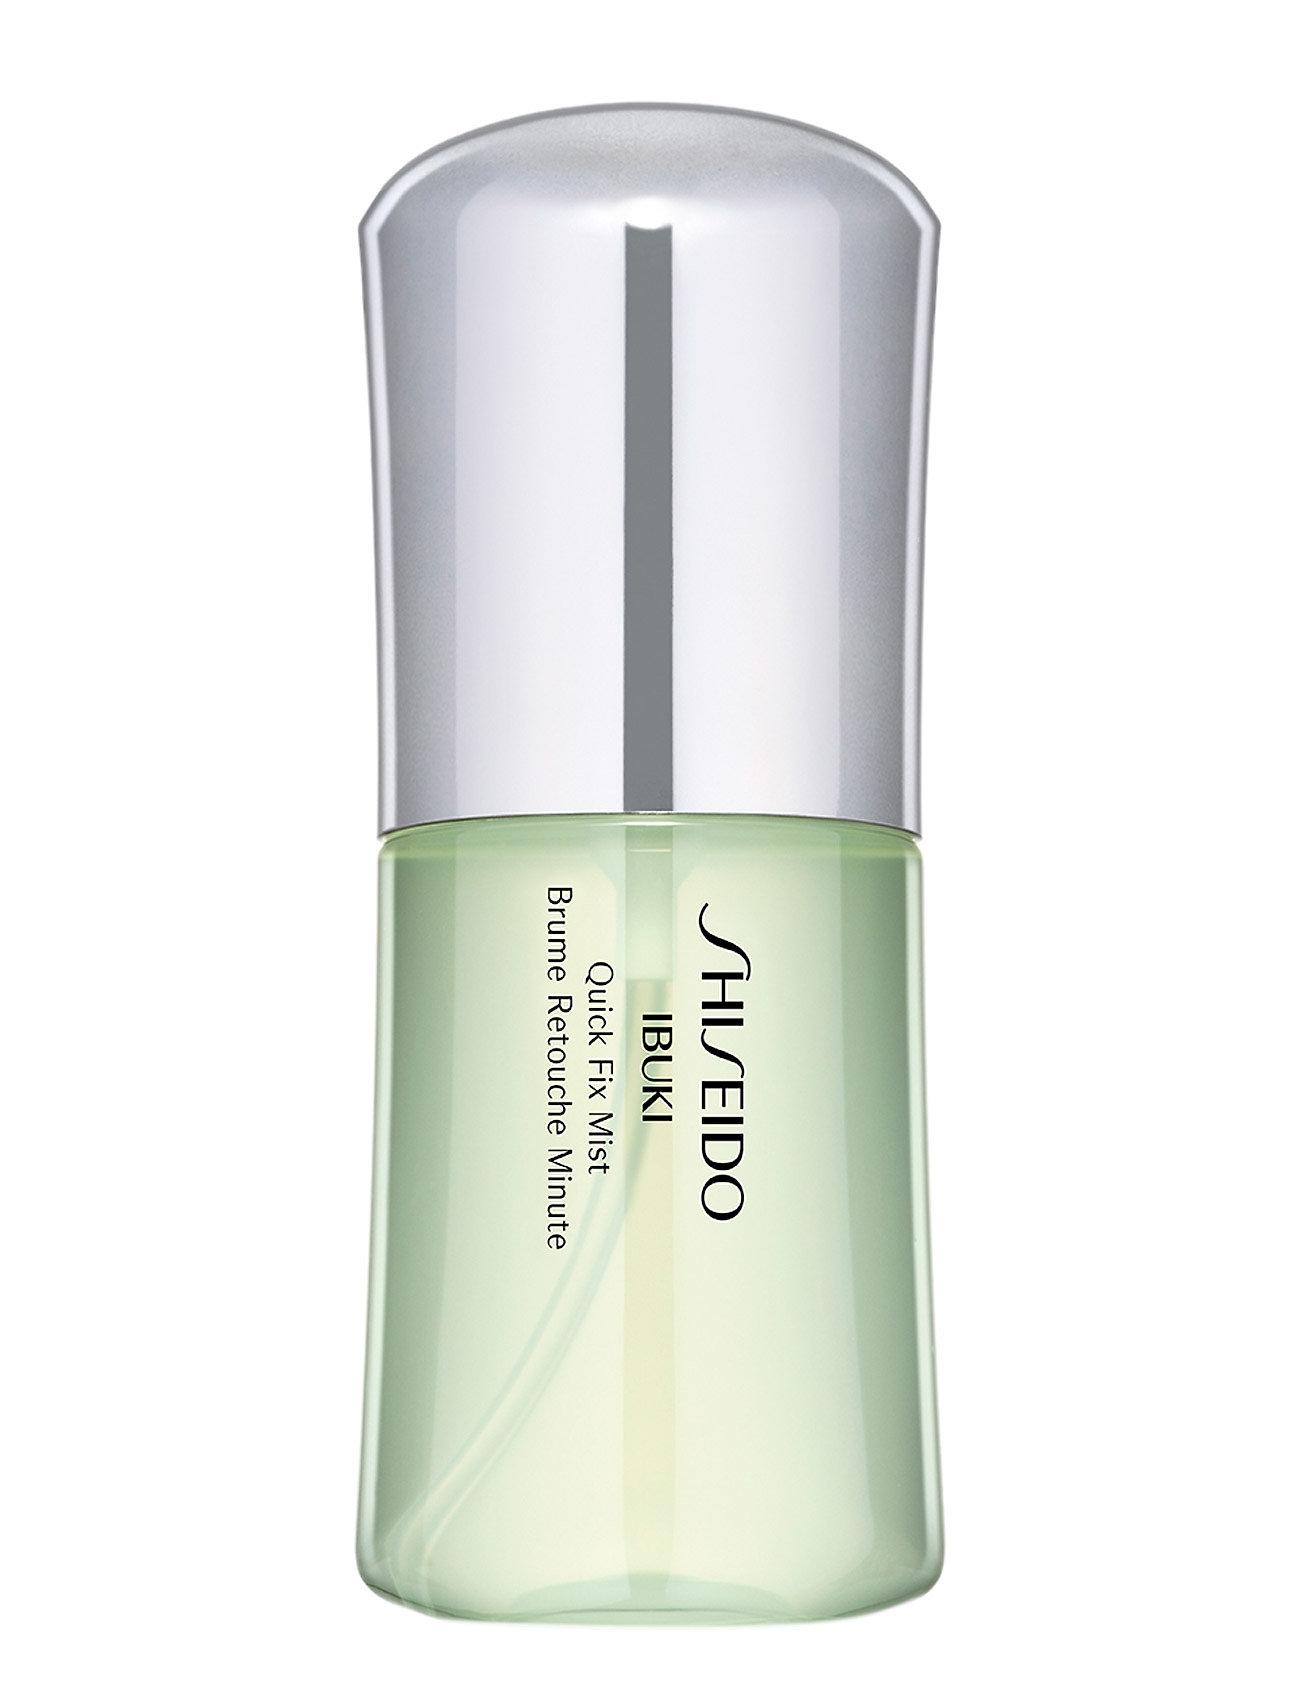 Image of Ibuki Quick Fix Mist Beauty WOMEN Skin Care Face T Rs Nude Shiseido (3276248647)